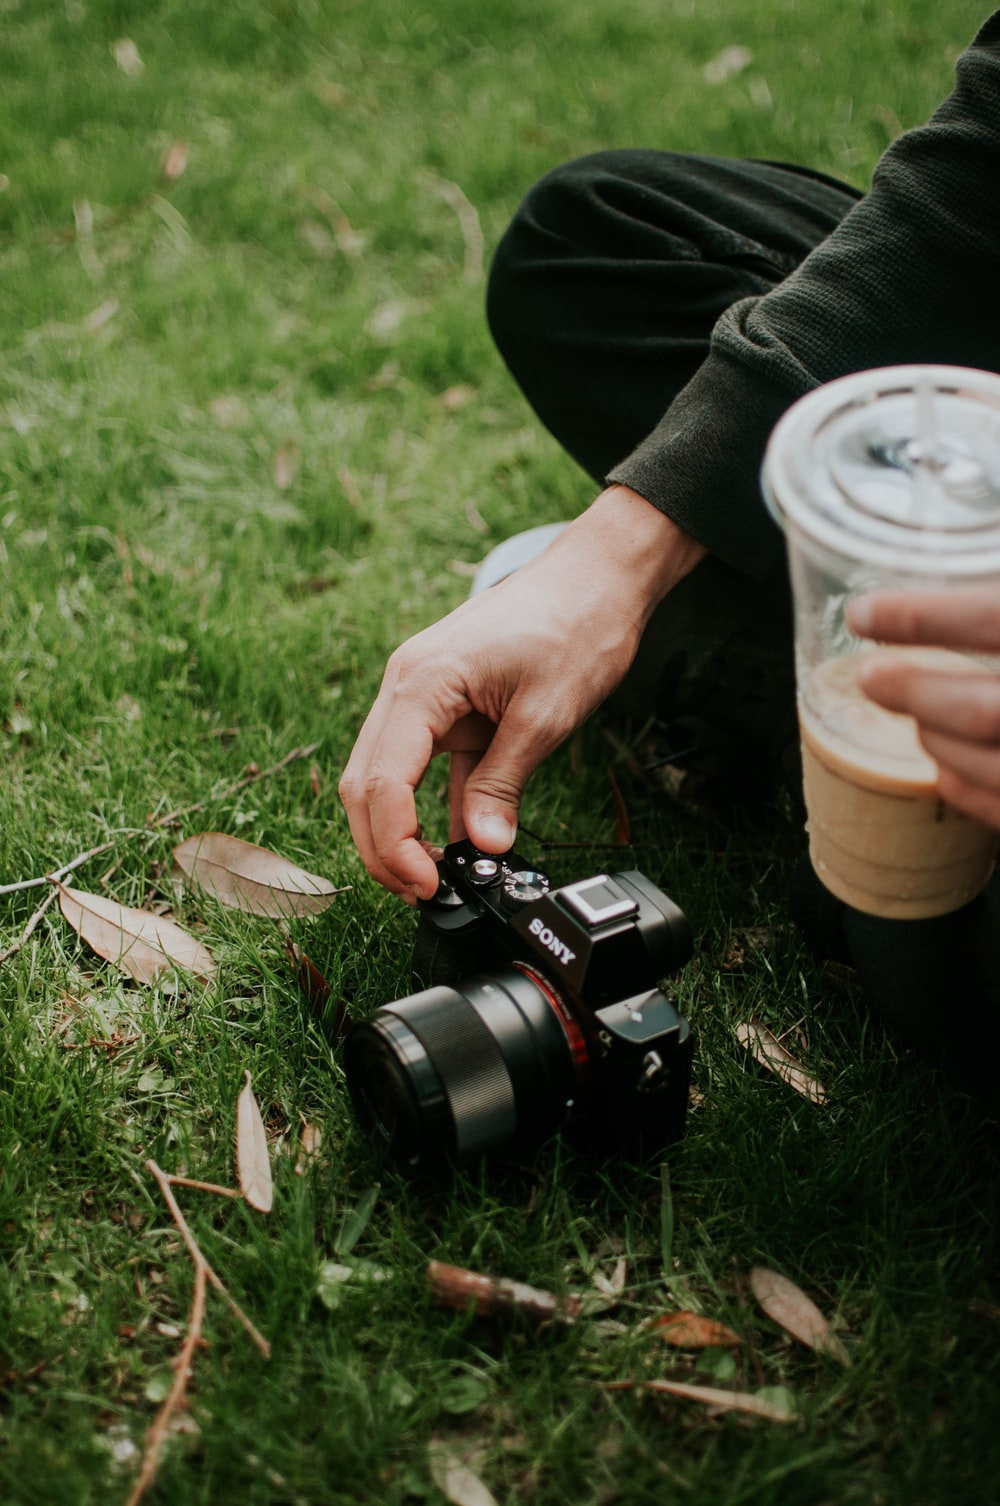 person using black Sony SLR camera on green grass field